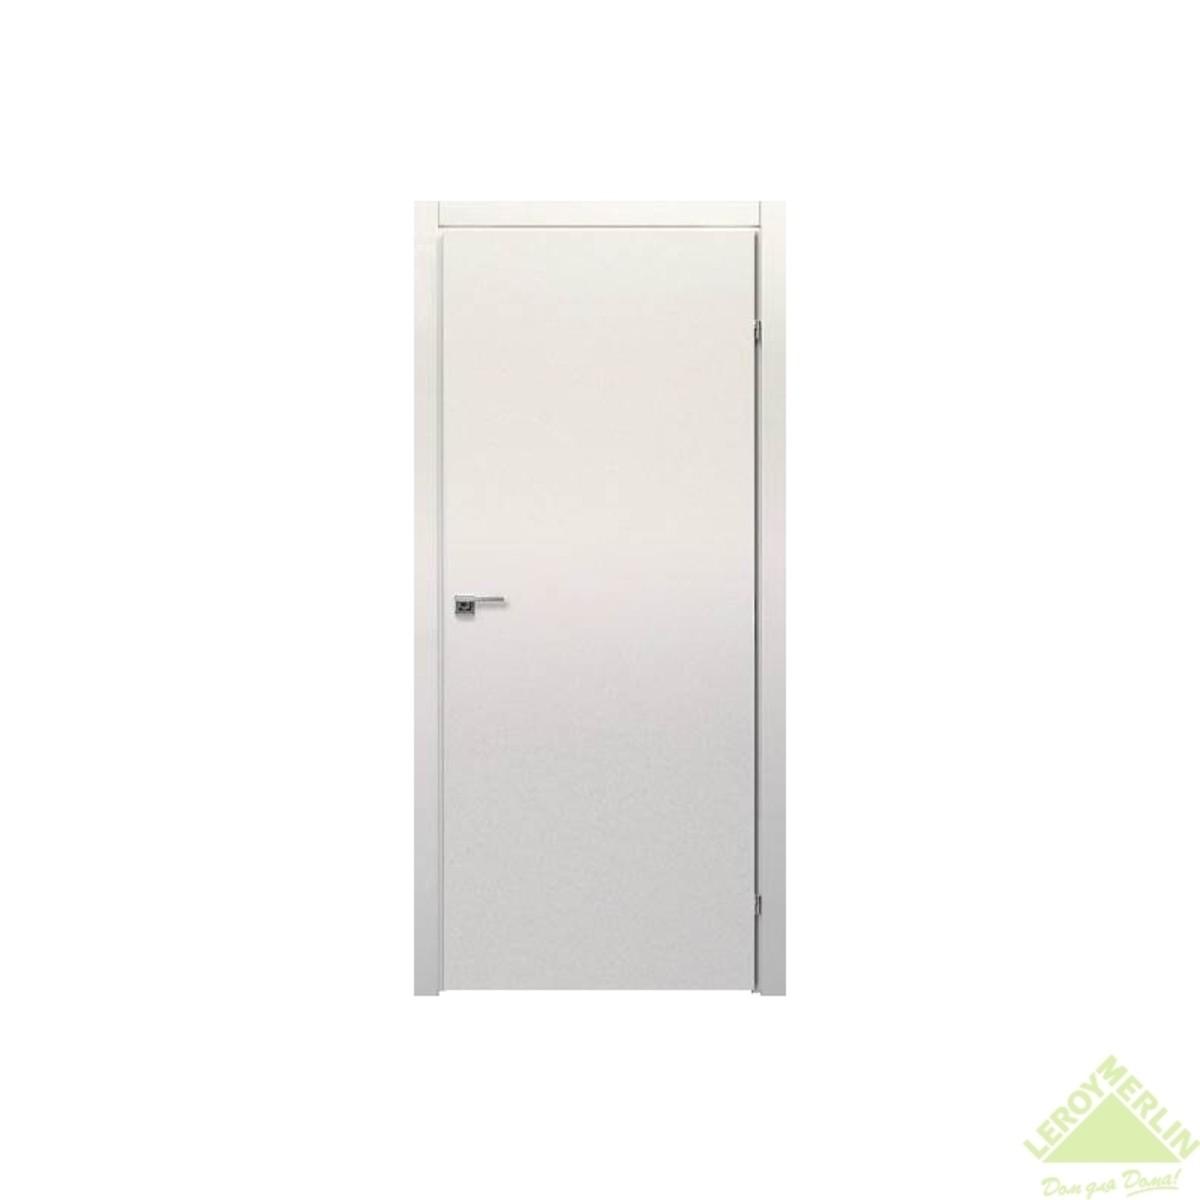 Дверь межкомнатная глухая 800x2000 мм ламинация белый с фурнитурой